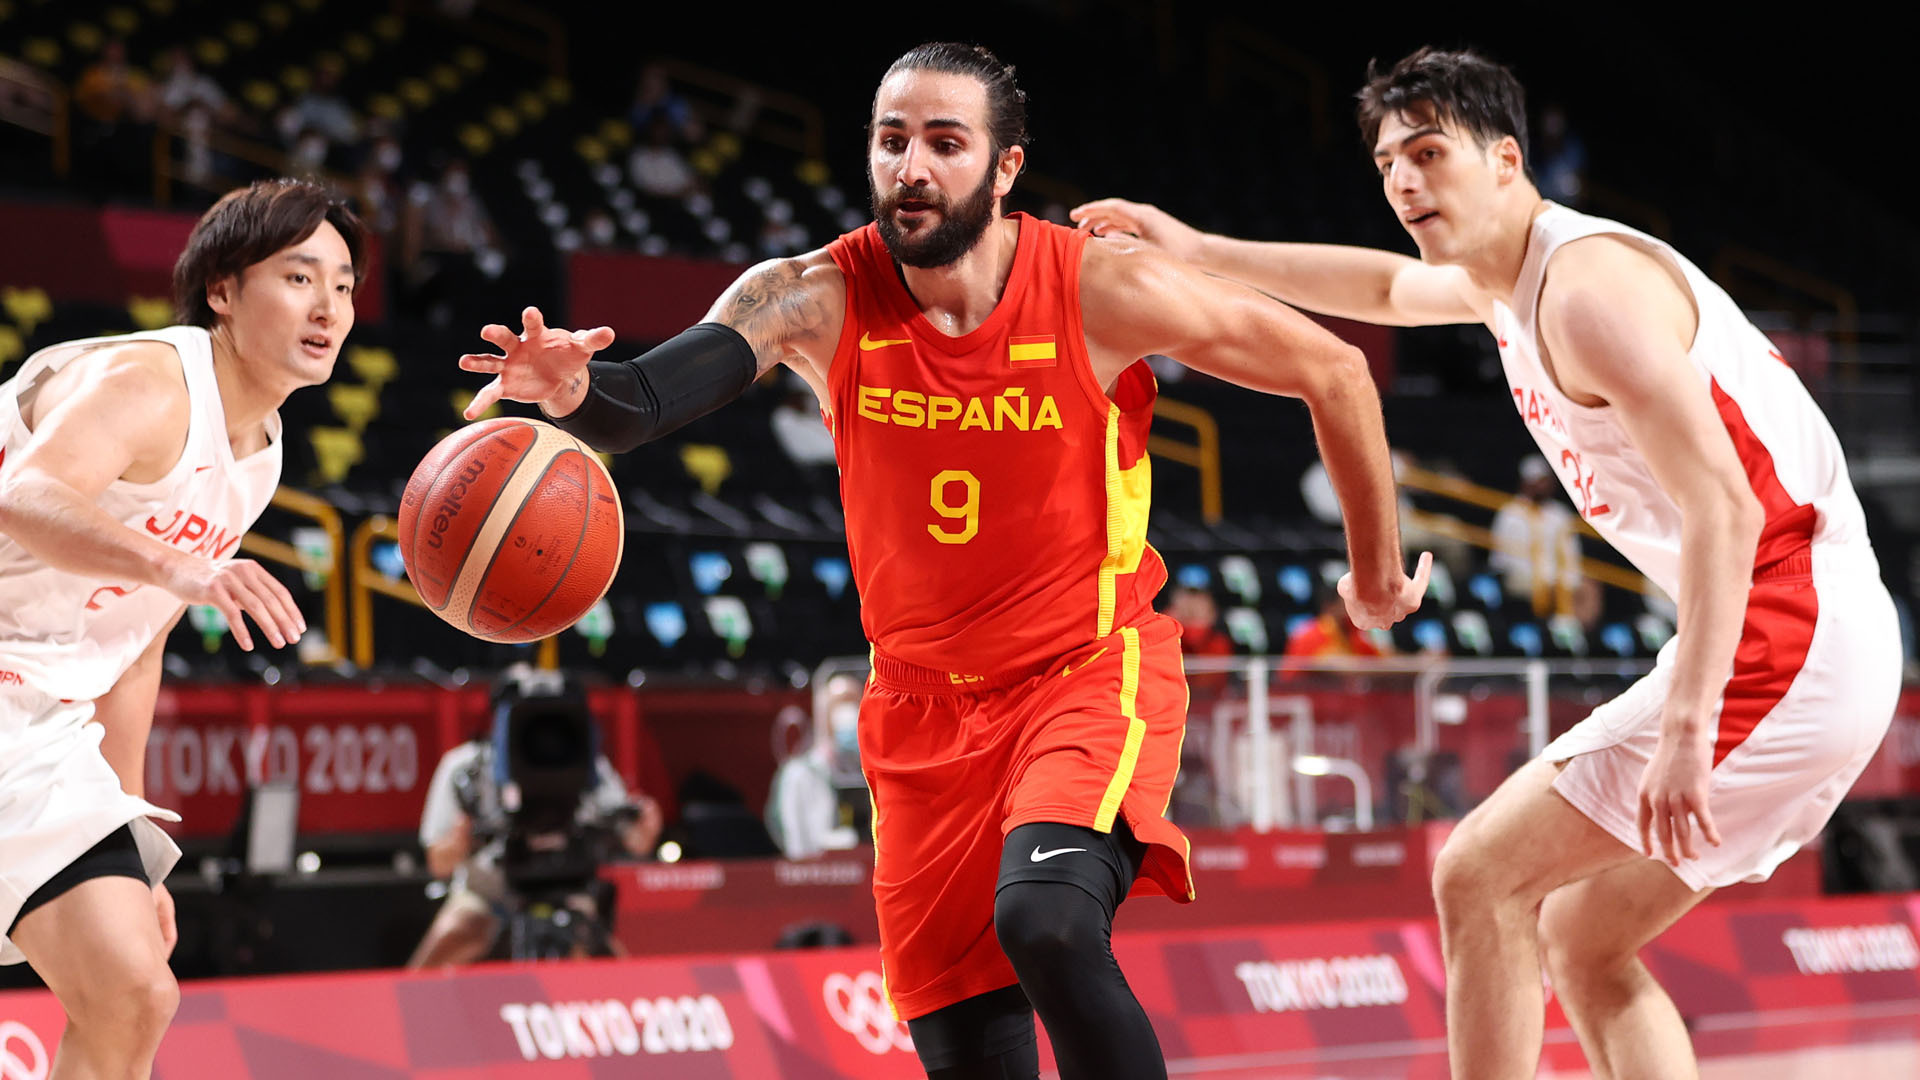 Spain gets commanding win in Olympic opener against Japan